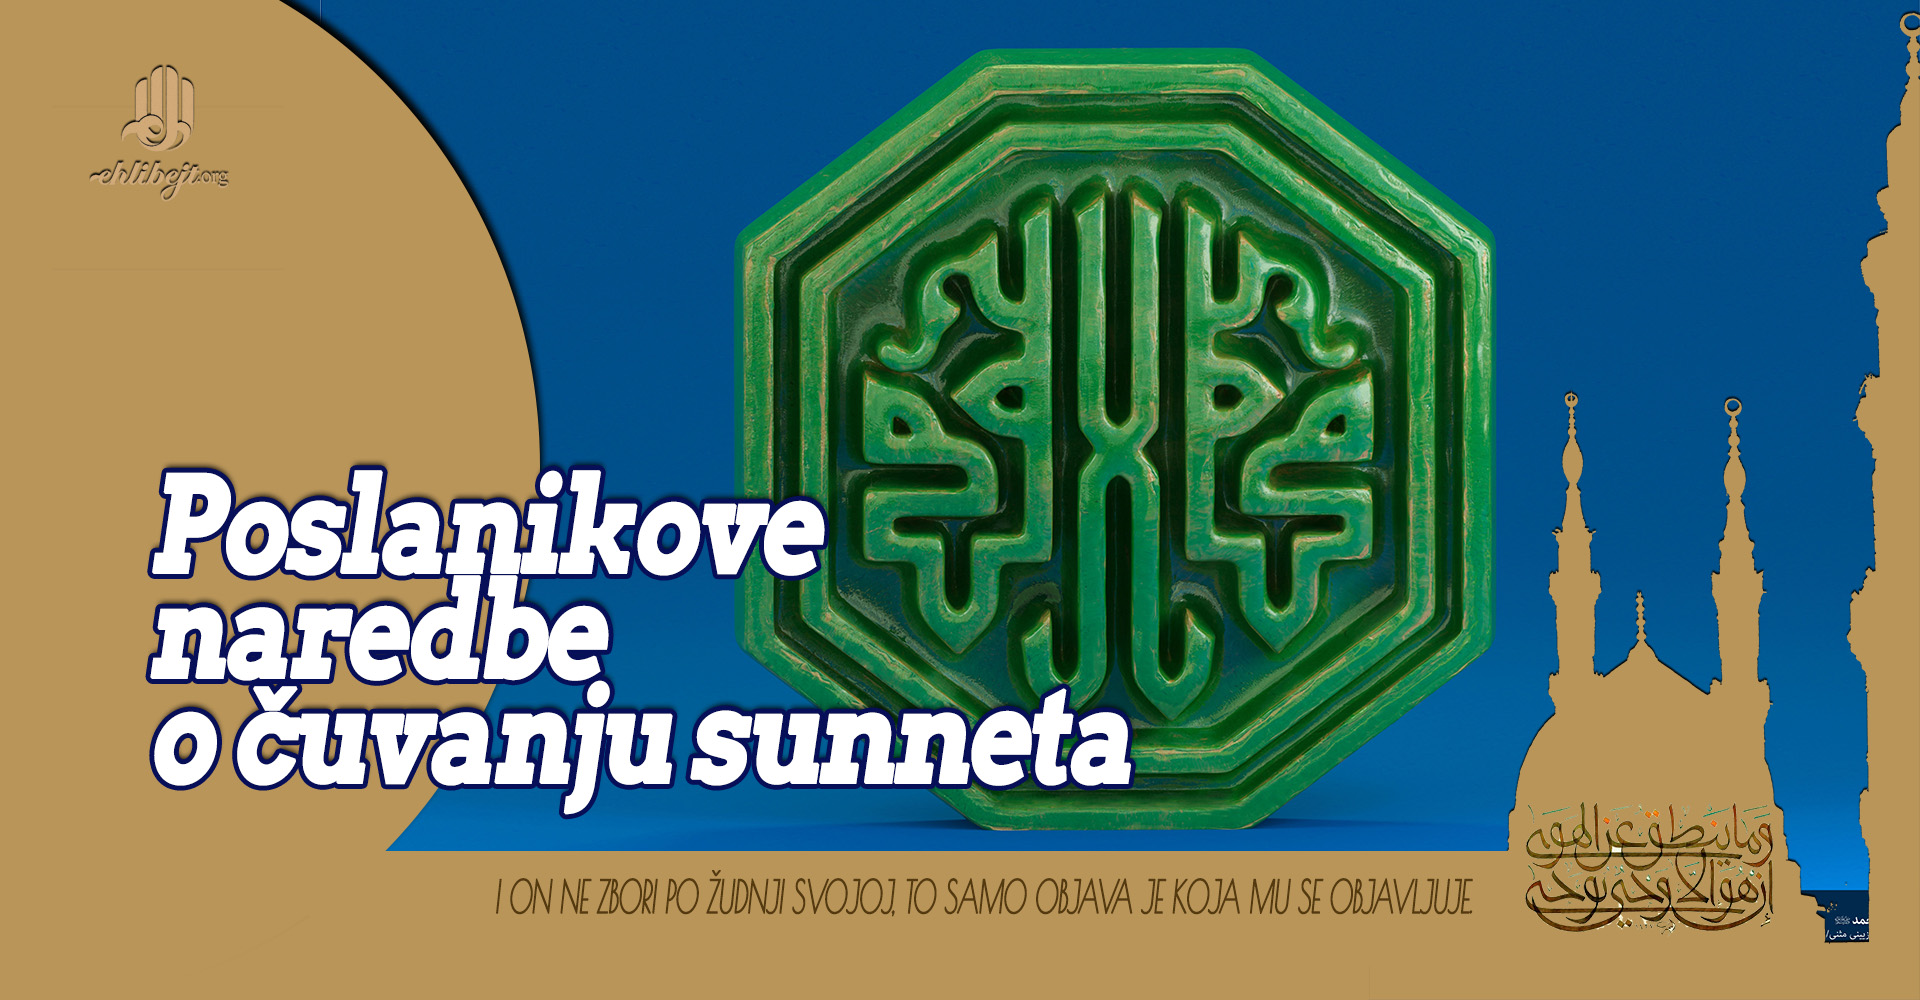 Poslanikove naredbe o čuvanju sunneta